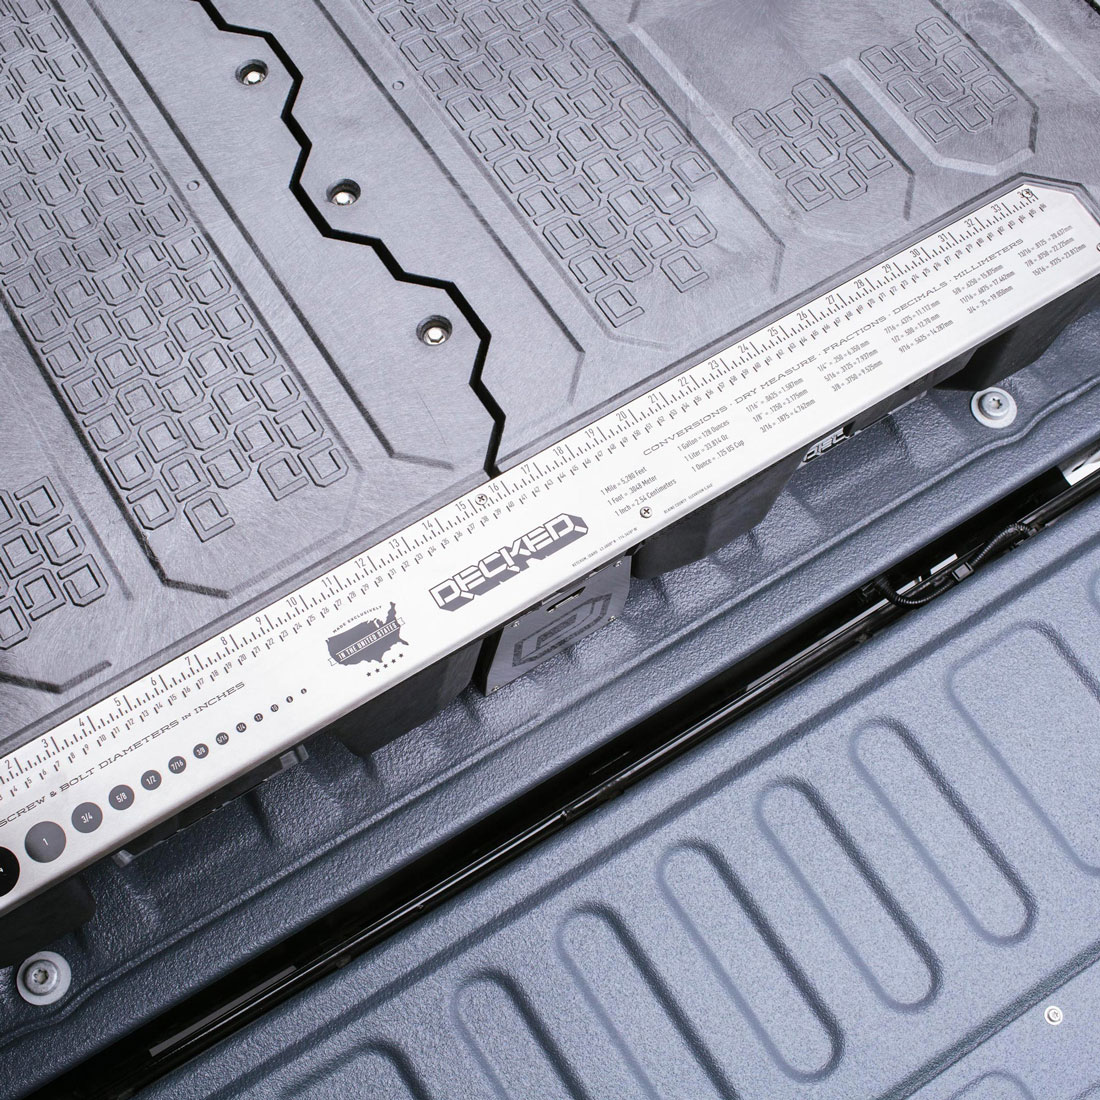 Pad-printed metal ruler doubles as deck edging detail